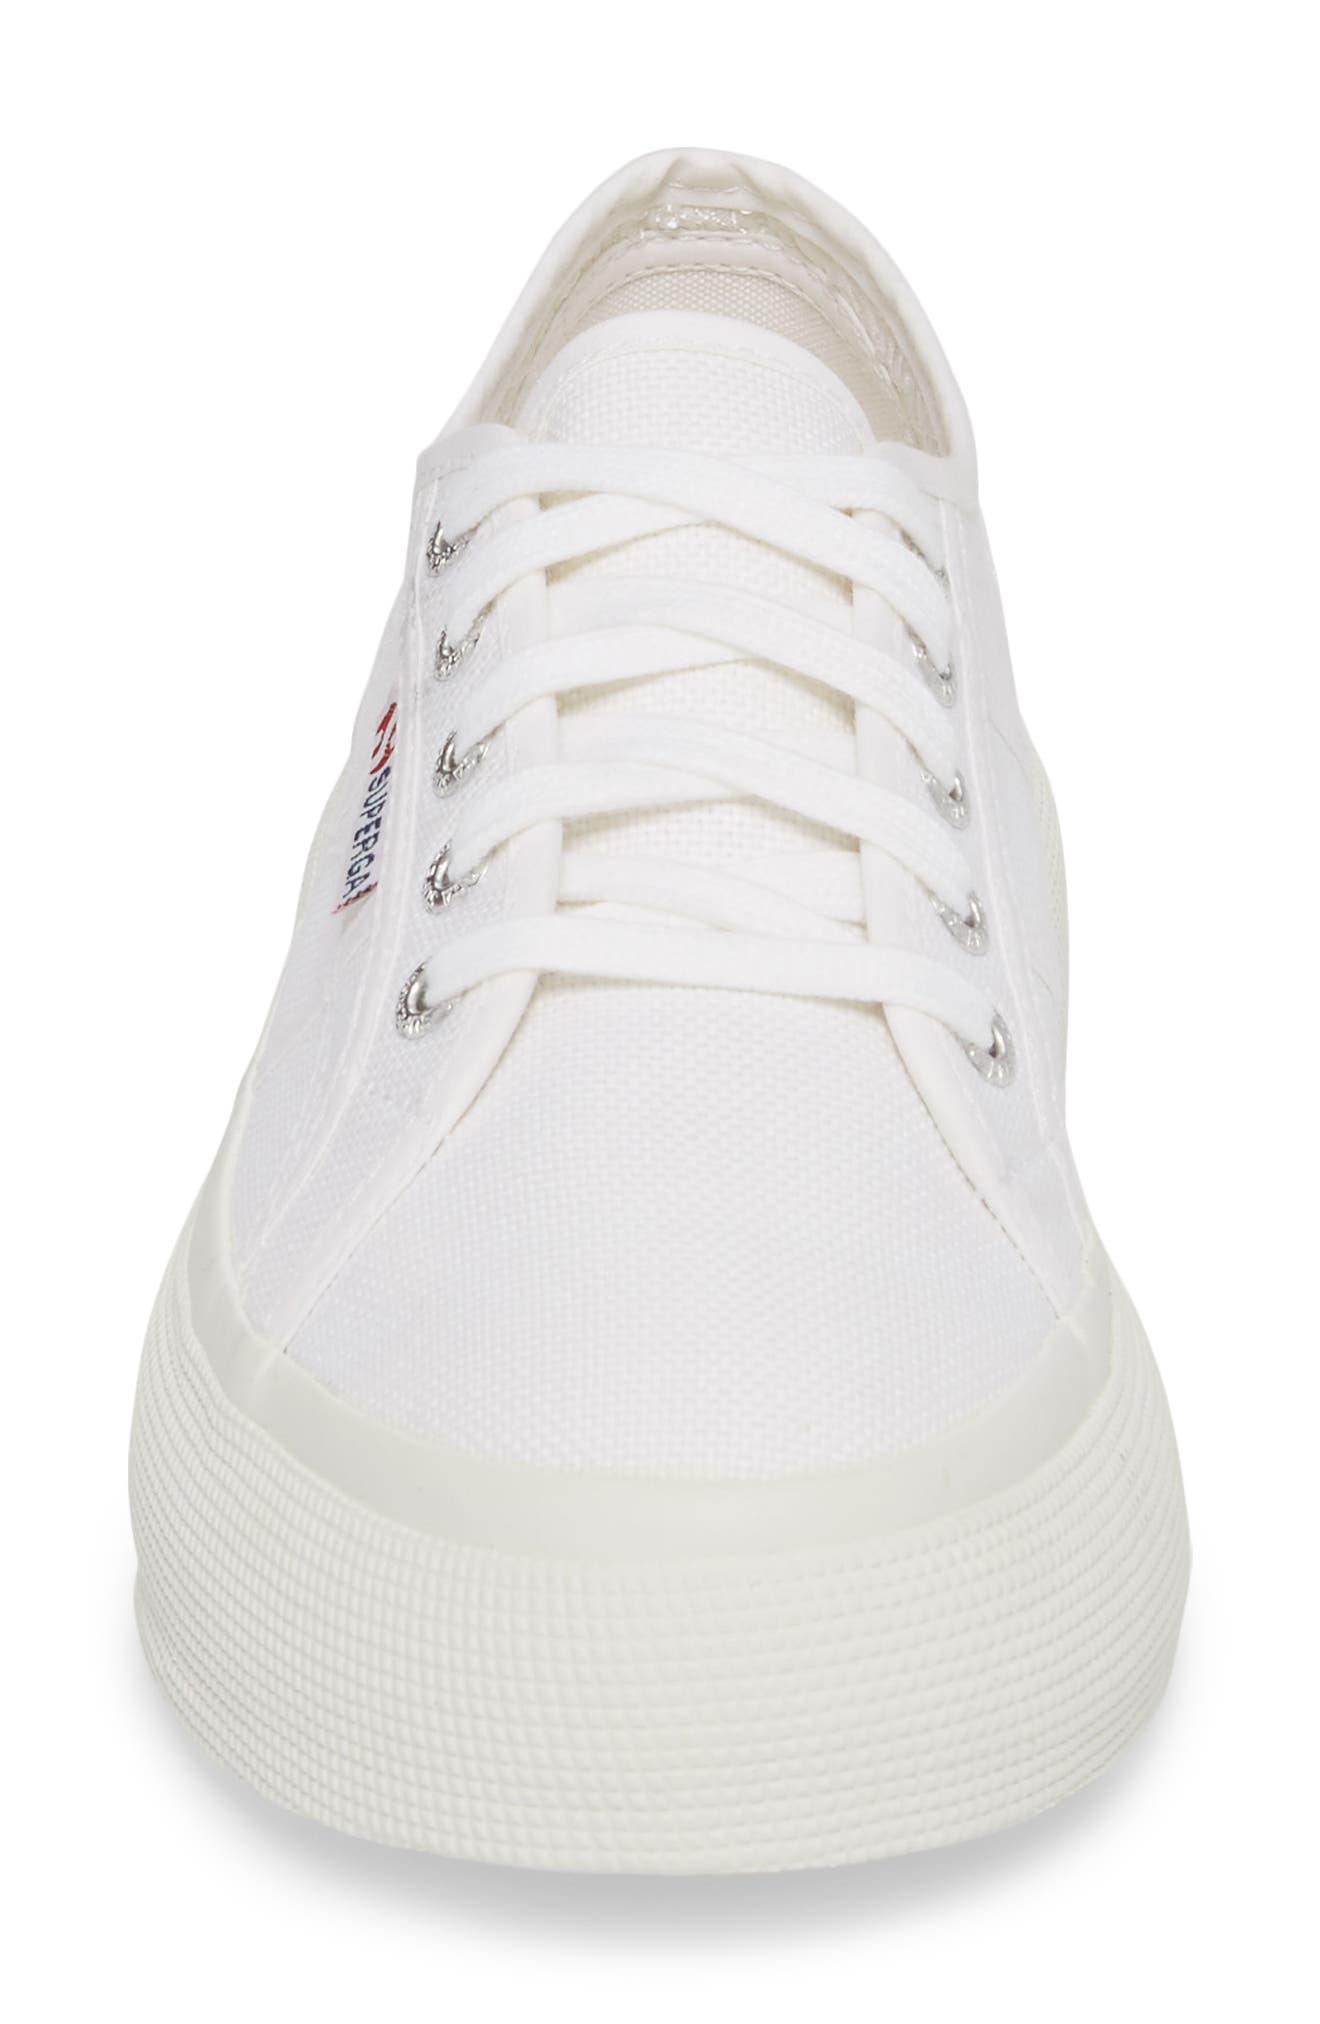 2287 Cotu Platform Sneaker,                             Alternate thumbnail 7, color,